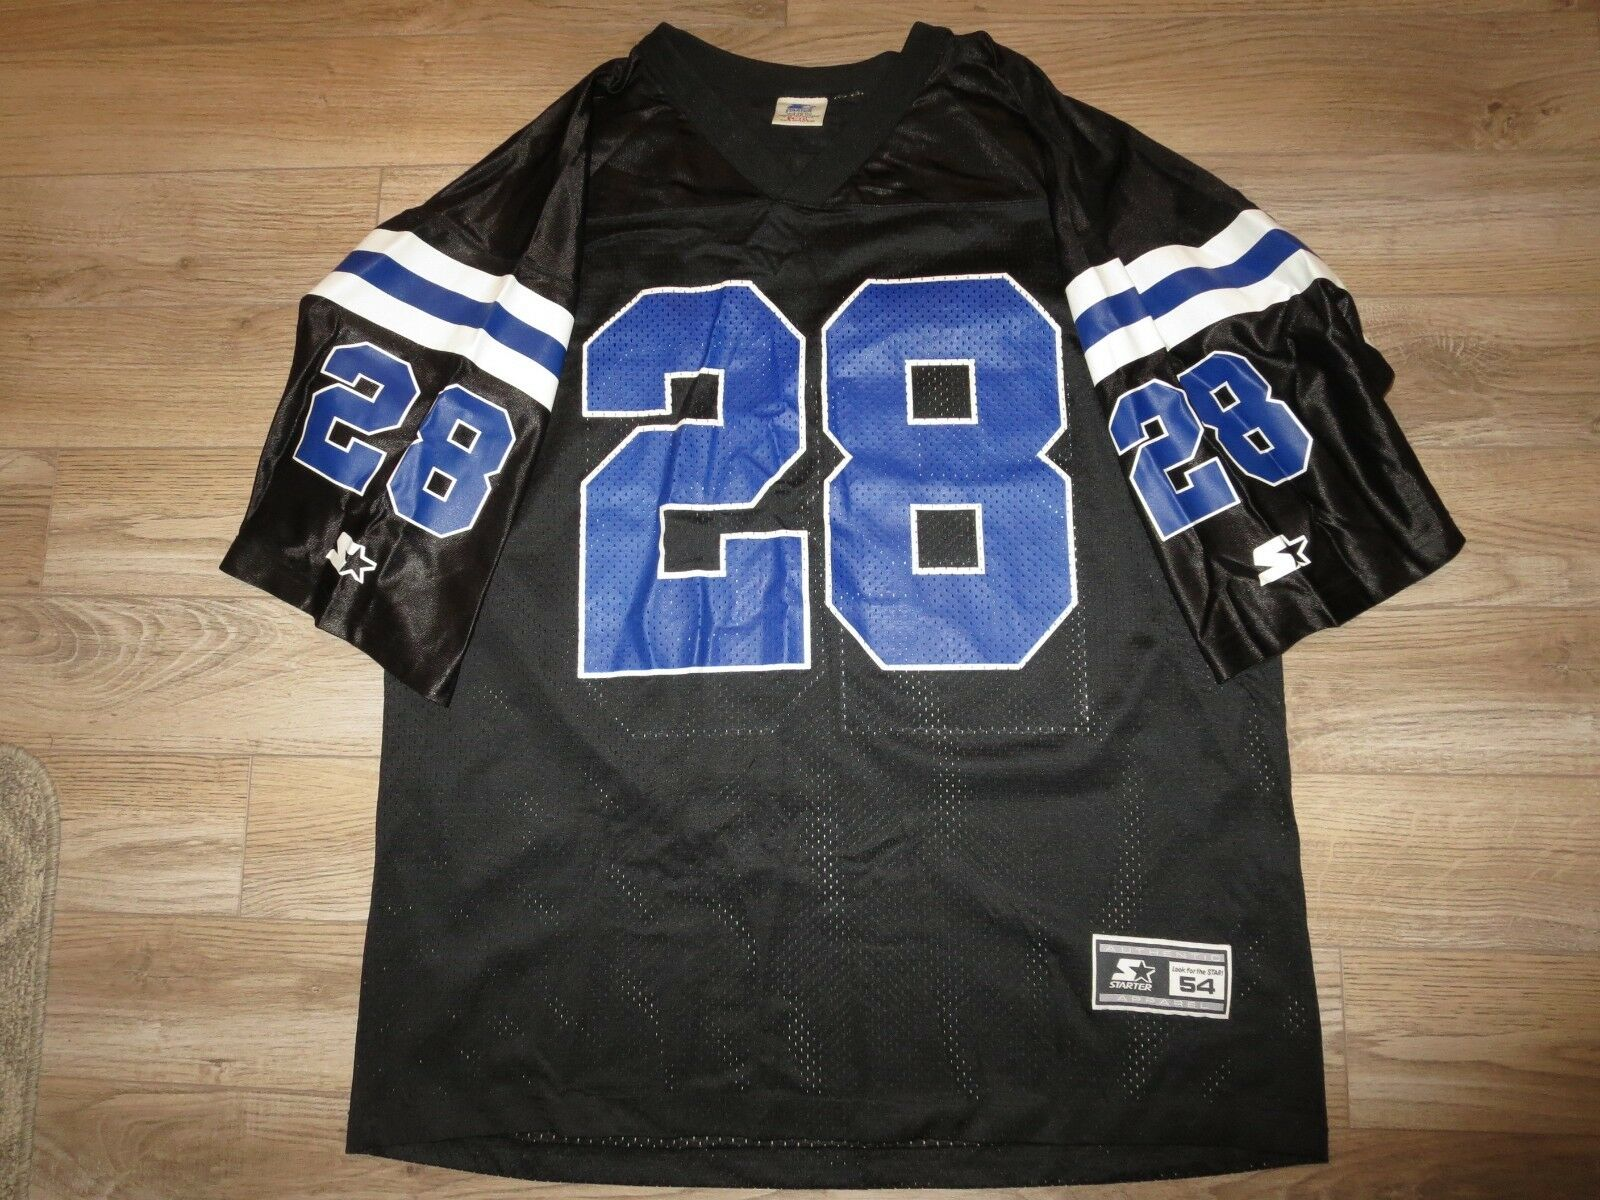 Marshall Faulk  28 Indianapolis Colts NFL Negro Edición Starter Camiseta 2XL 2x